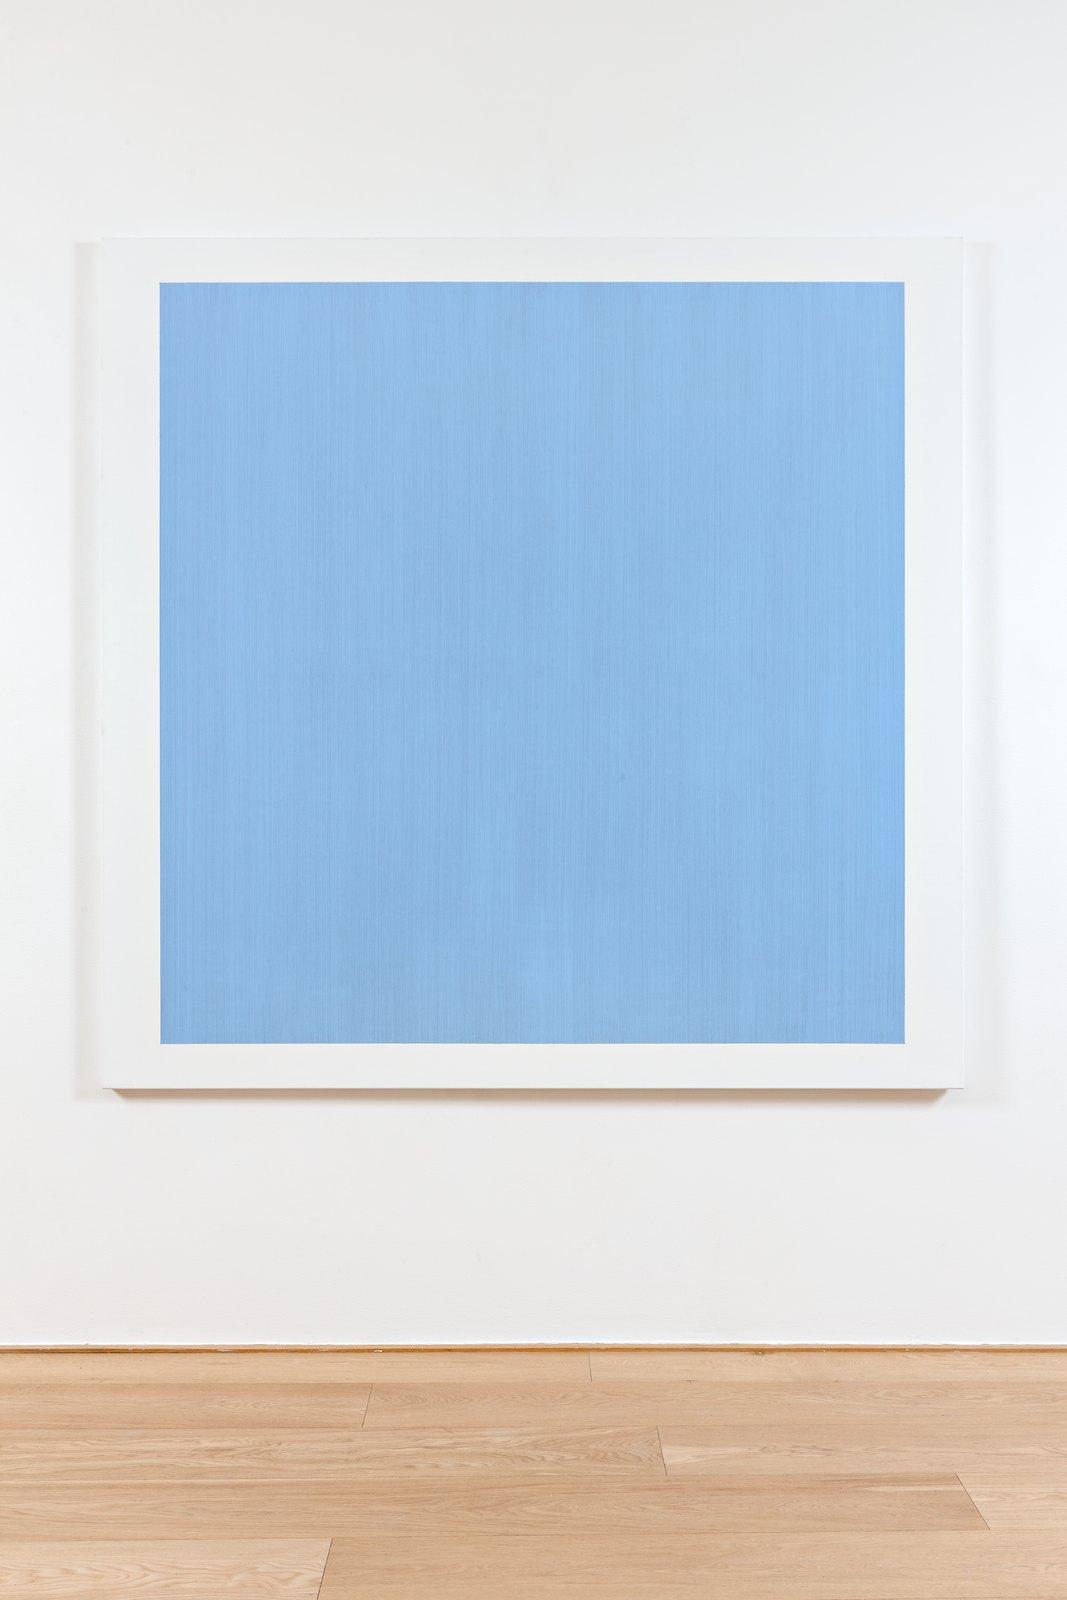 Arne Malmedal, Untitled, 2005, oil on canvas, 194 x 194 cm